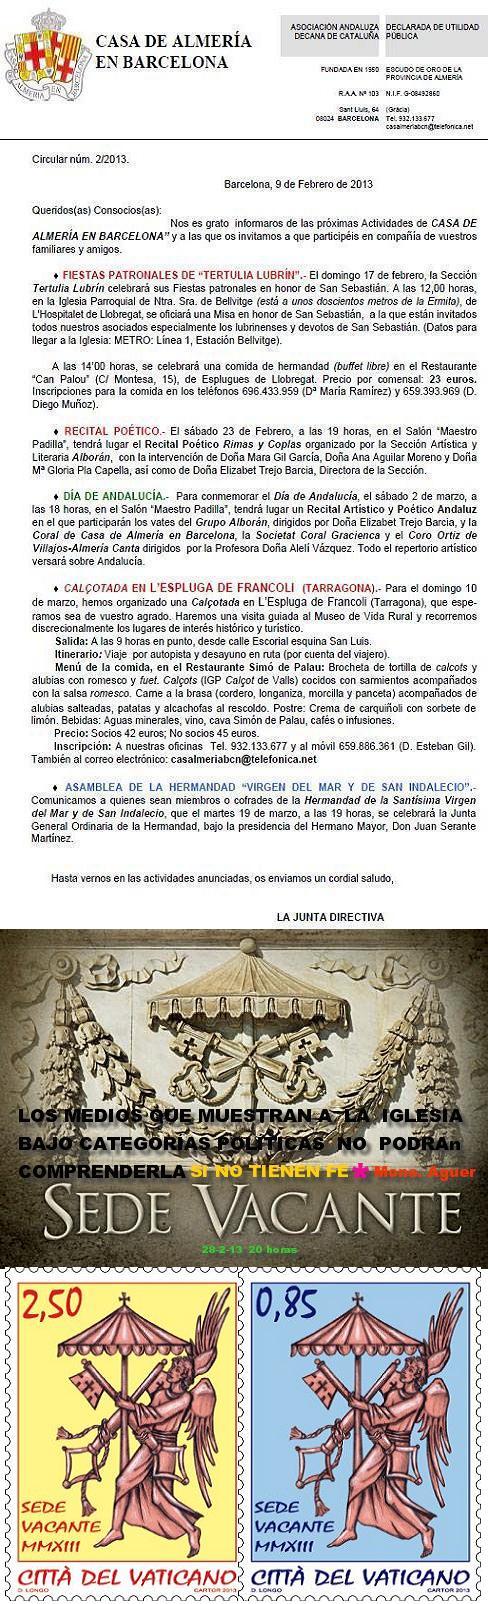 20130312193649-circular-2-2013-sede-vacante.jpg